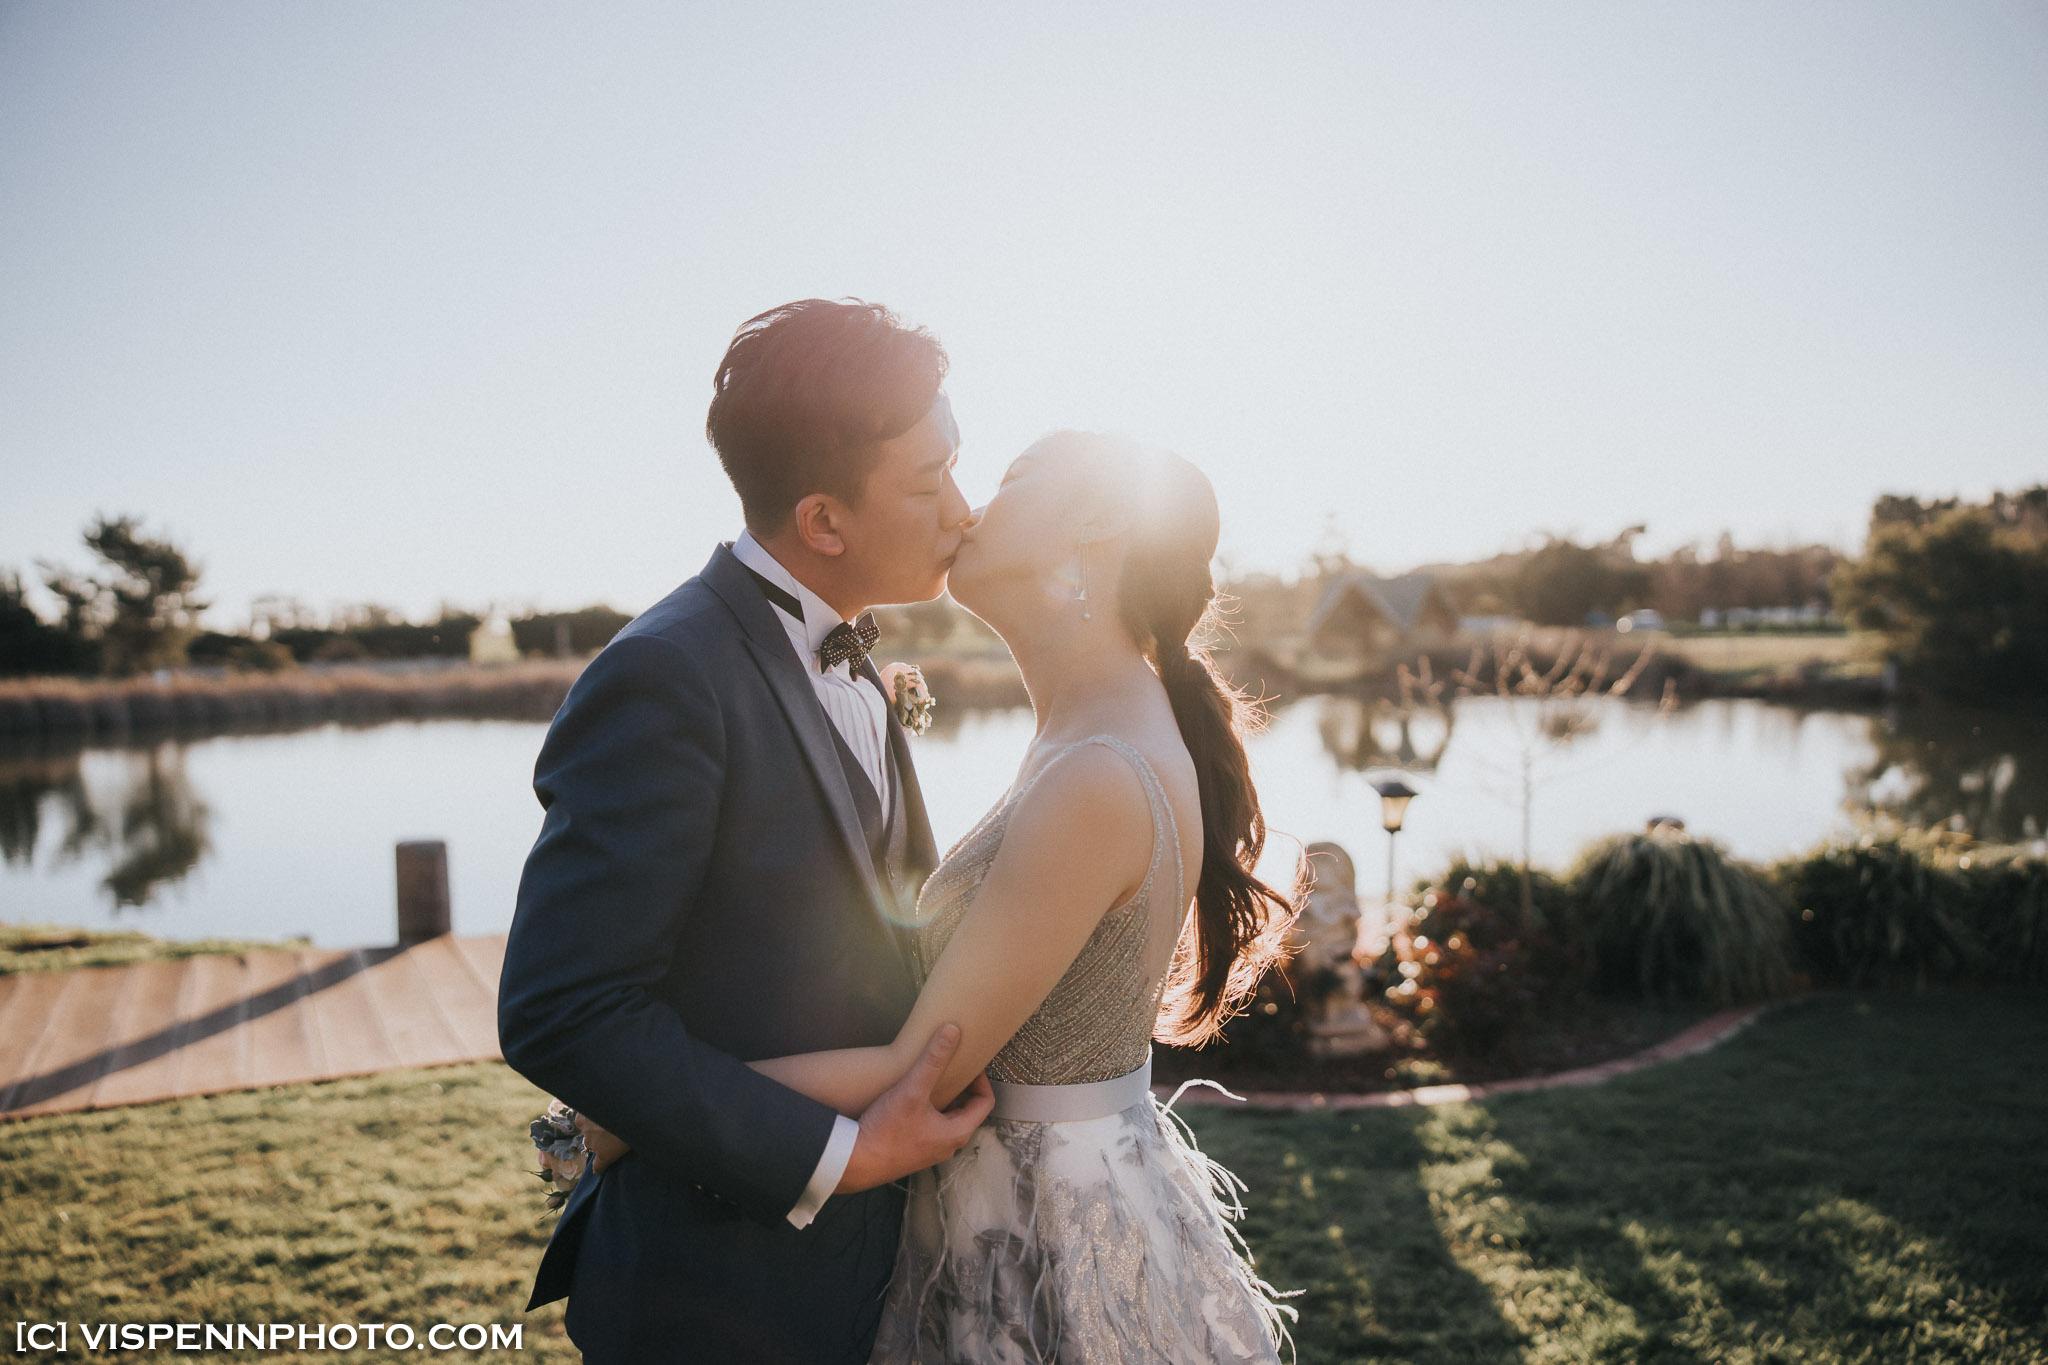 WEDDING DAY Photography Melbourne VISPENN 墨尔本 婚礼跟拍 婚礼摄像 婚礼摄影 结婚照 登记照 AndyIcyWED 9880 EOSR VISPENN